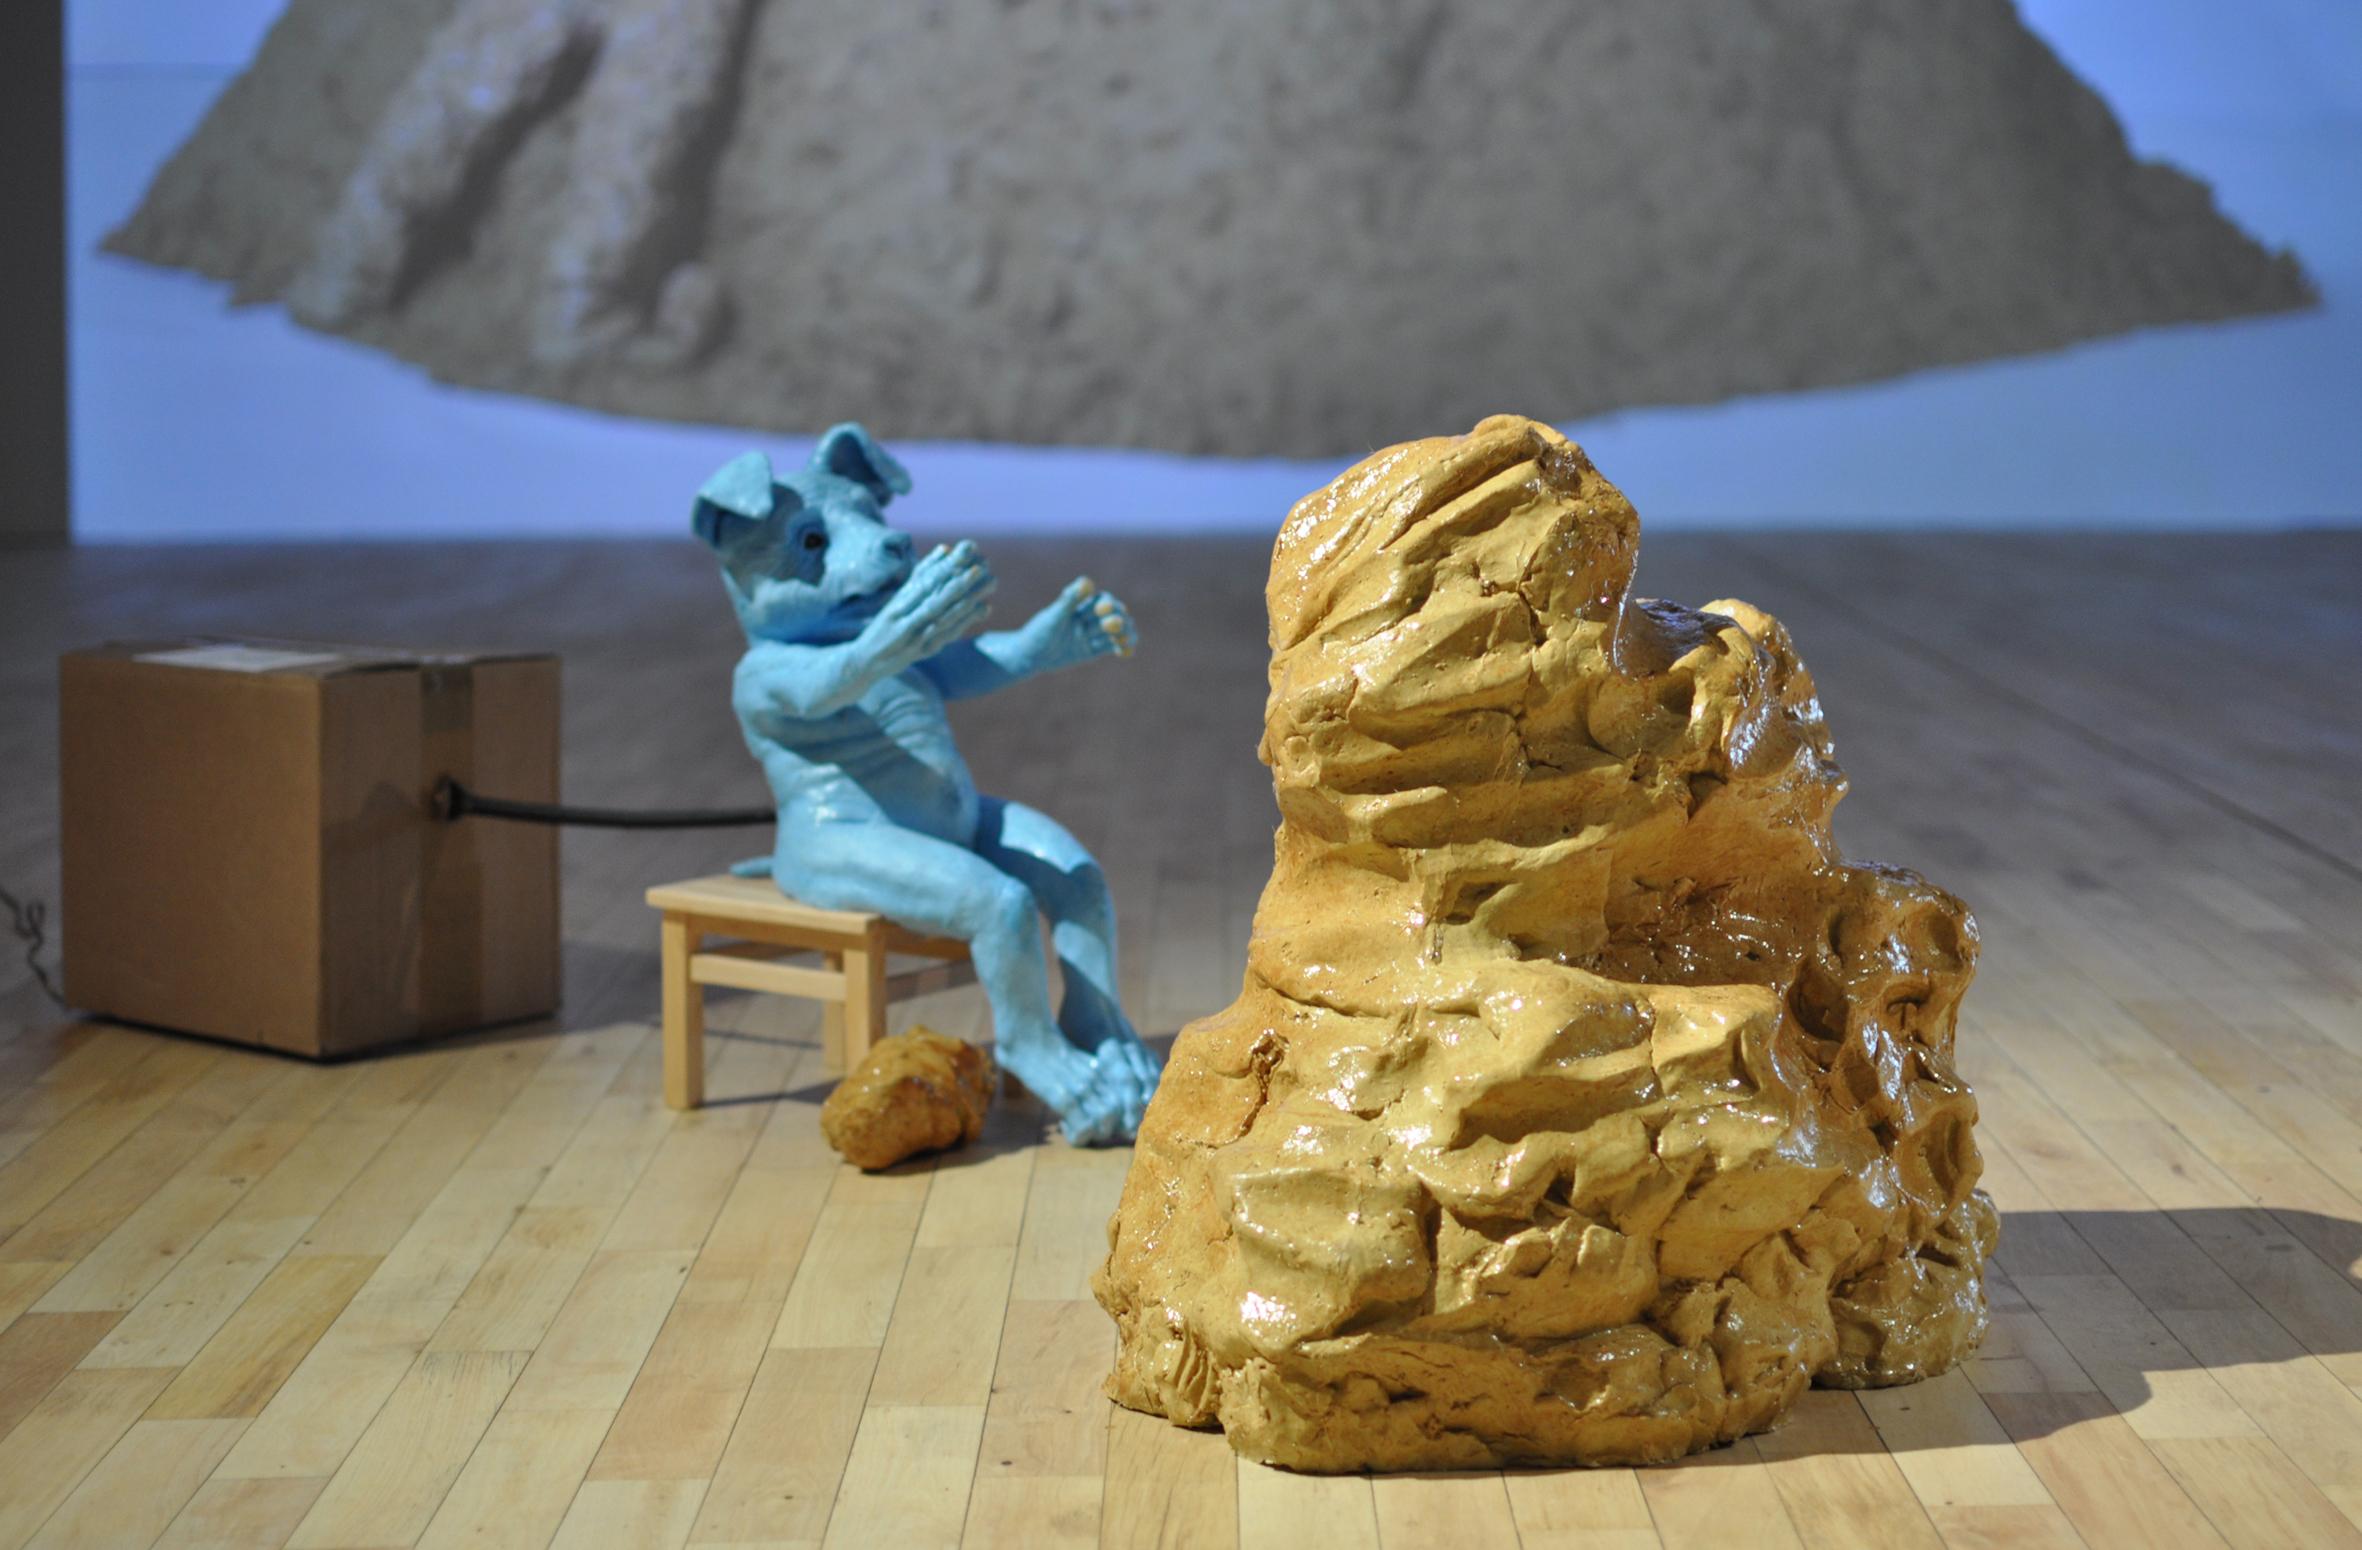 Tomasz Mróz, Défaitisme, widok wystawy